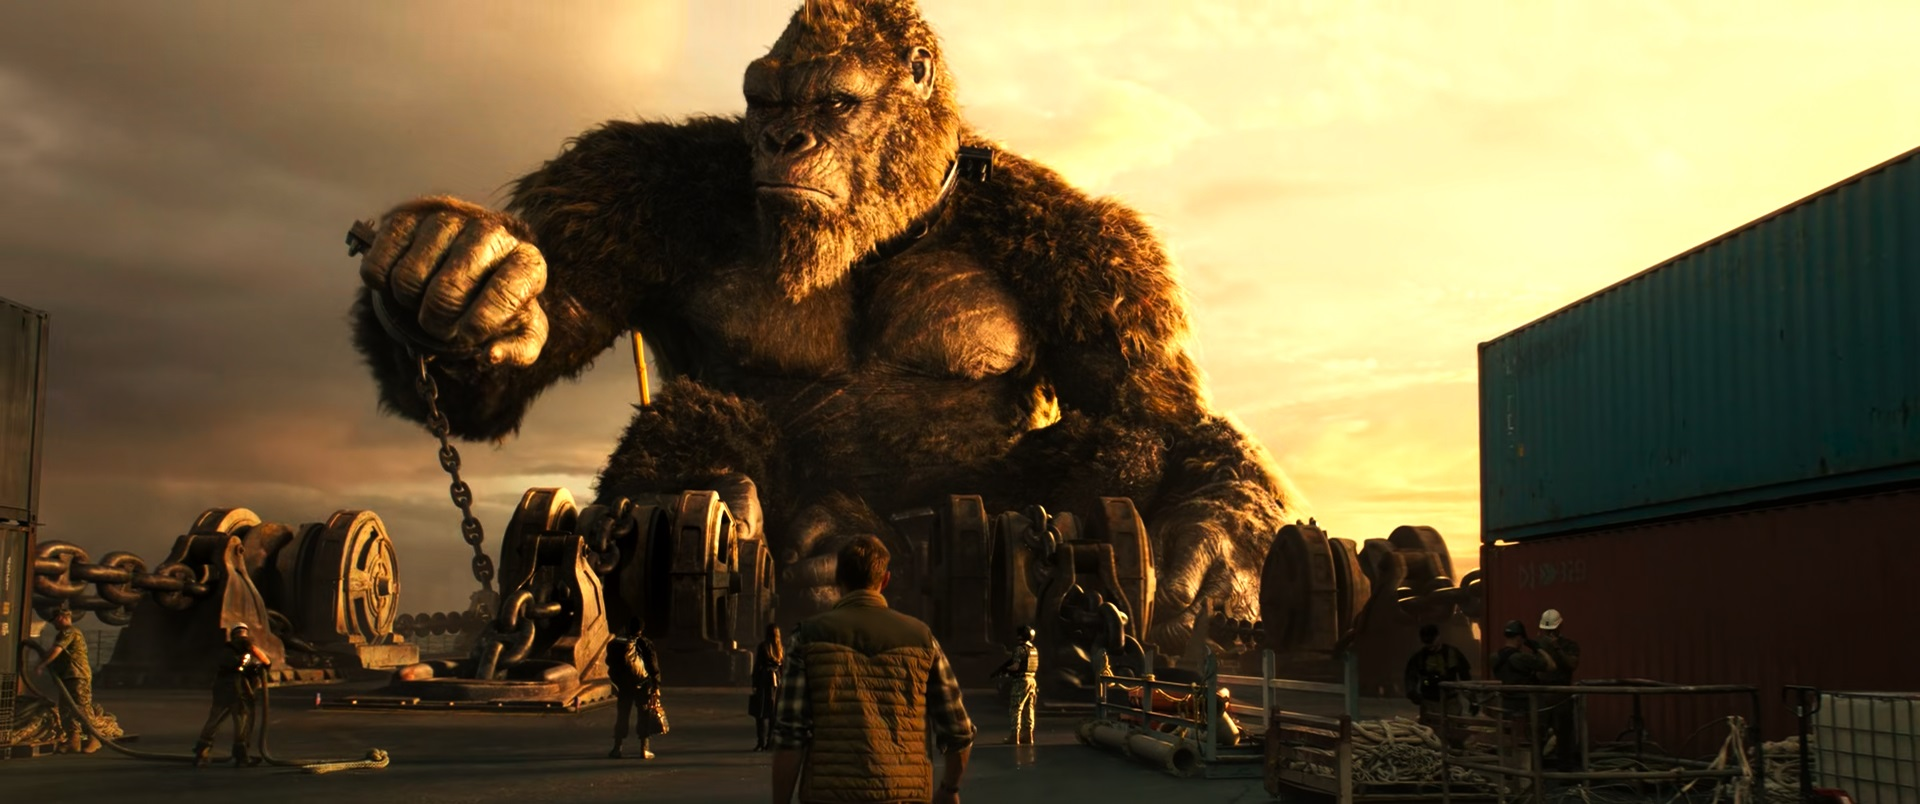 Godzilla vs. Kong | 2021 | WEB-DL | XviD | Türkçe Dublaj | m720p - m1080p | WEB-DL | Tek Link